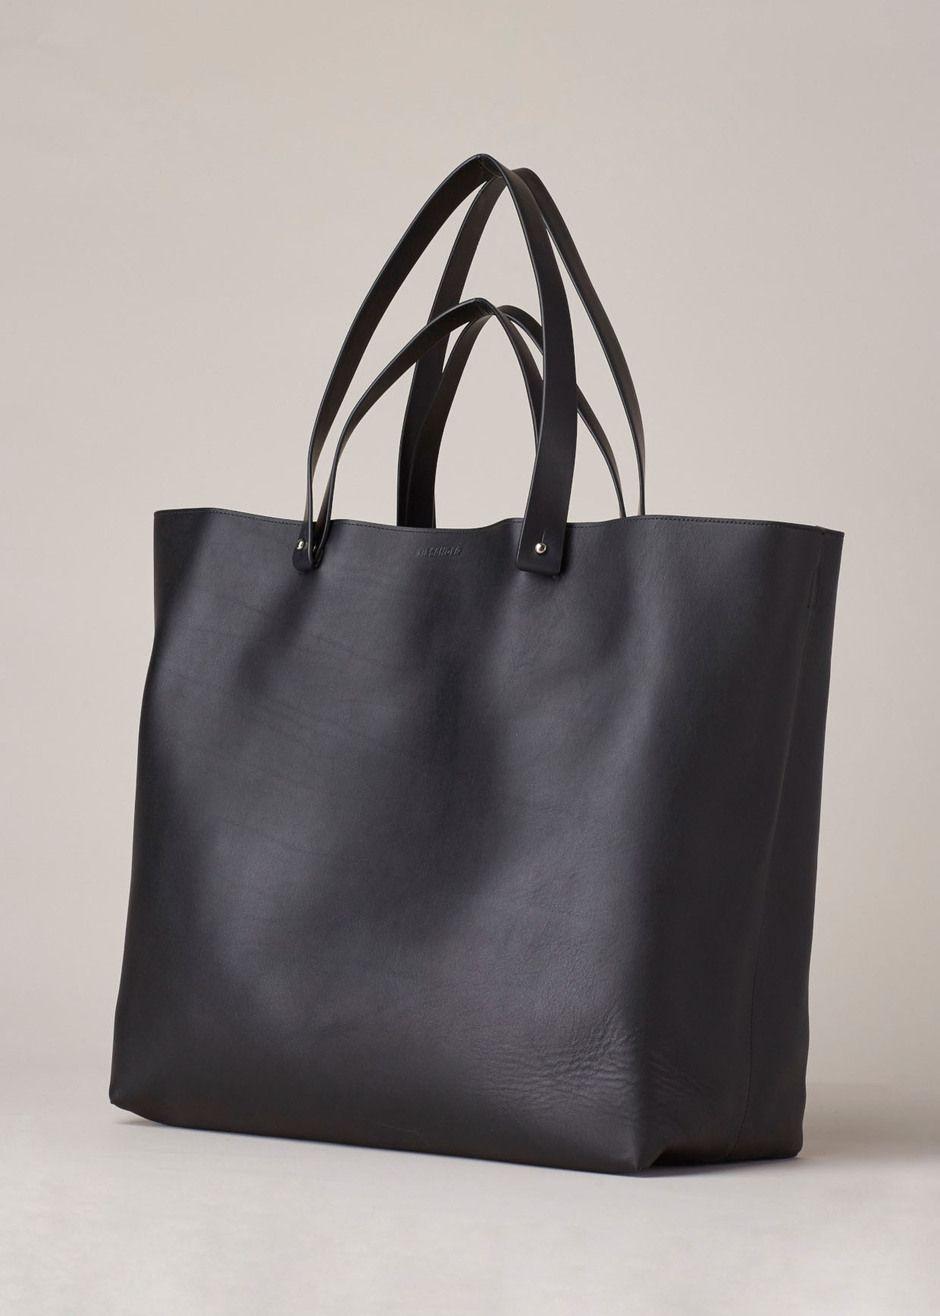 Jil Sander Bridle Bag (Black)  403aa93acb9